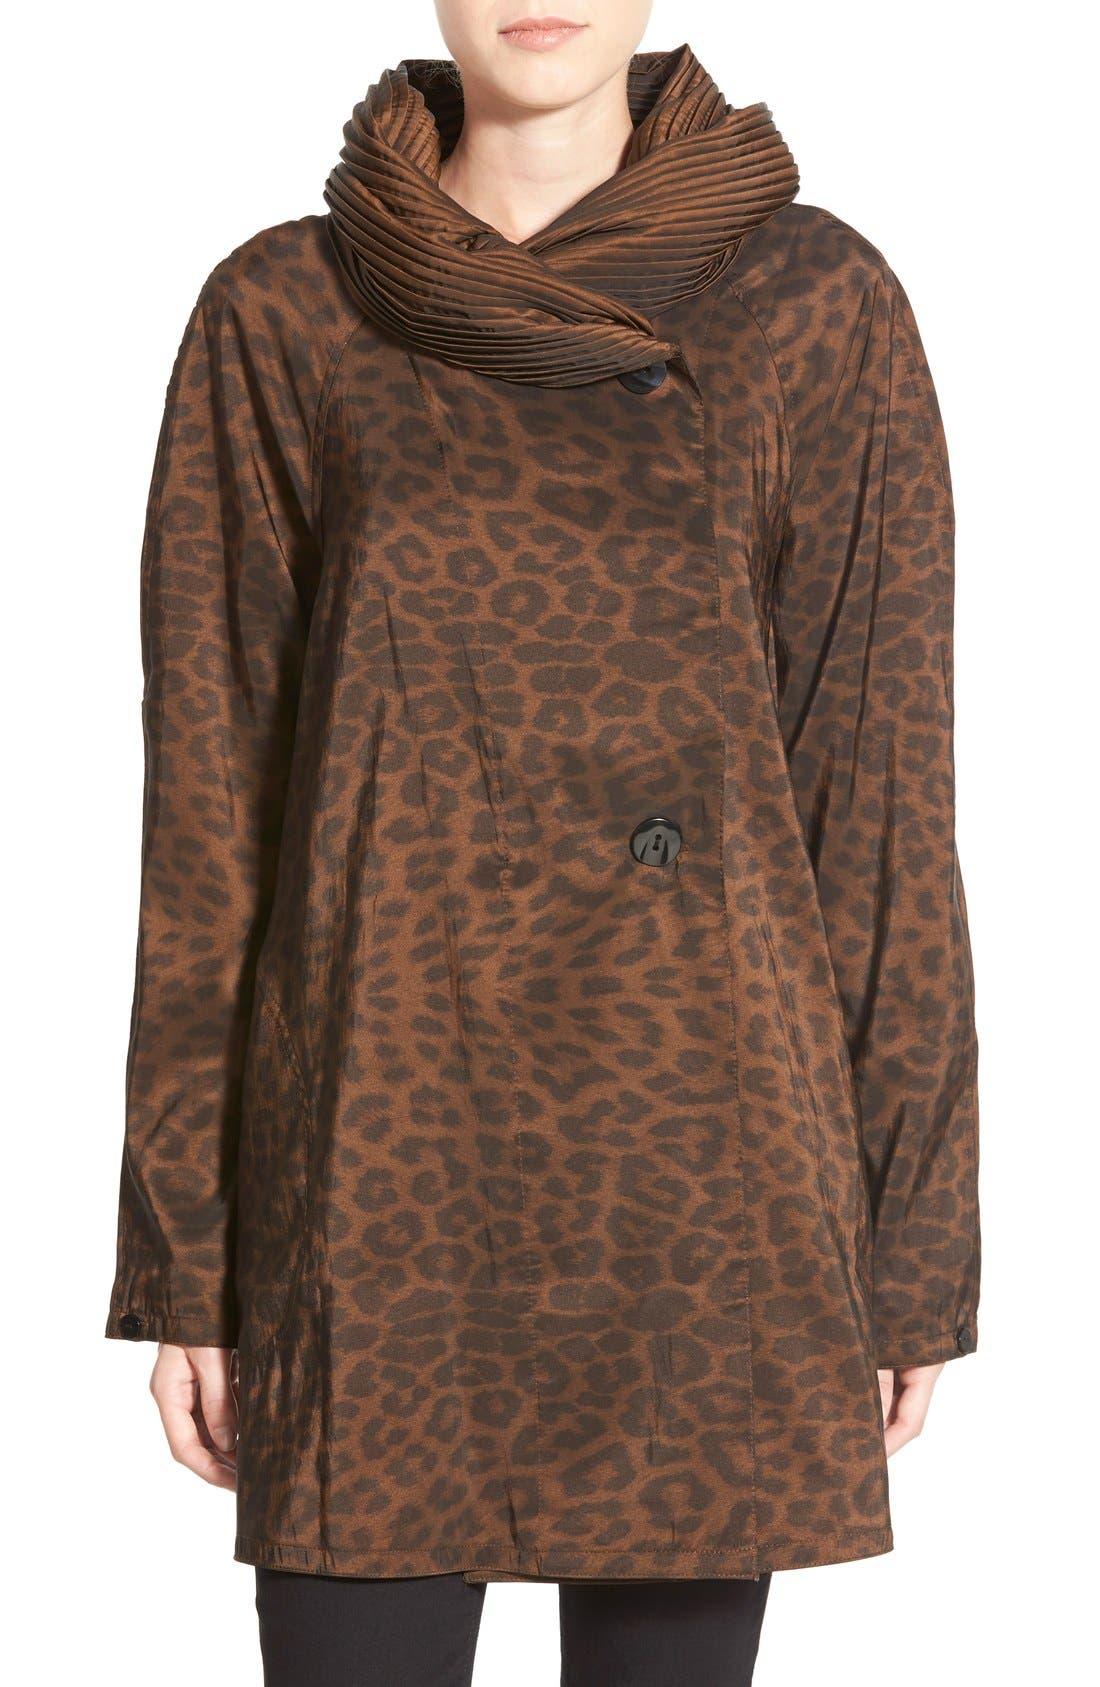 'Mini Donatella Leopard' Reversible Pleat Hood Packable Travel Coat,                             Alternate thumbnail 10, color,                             202